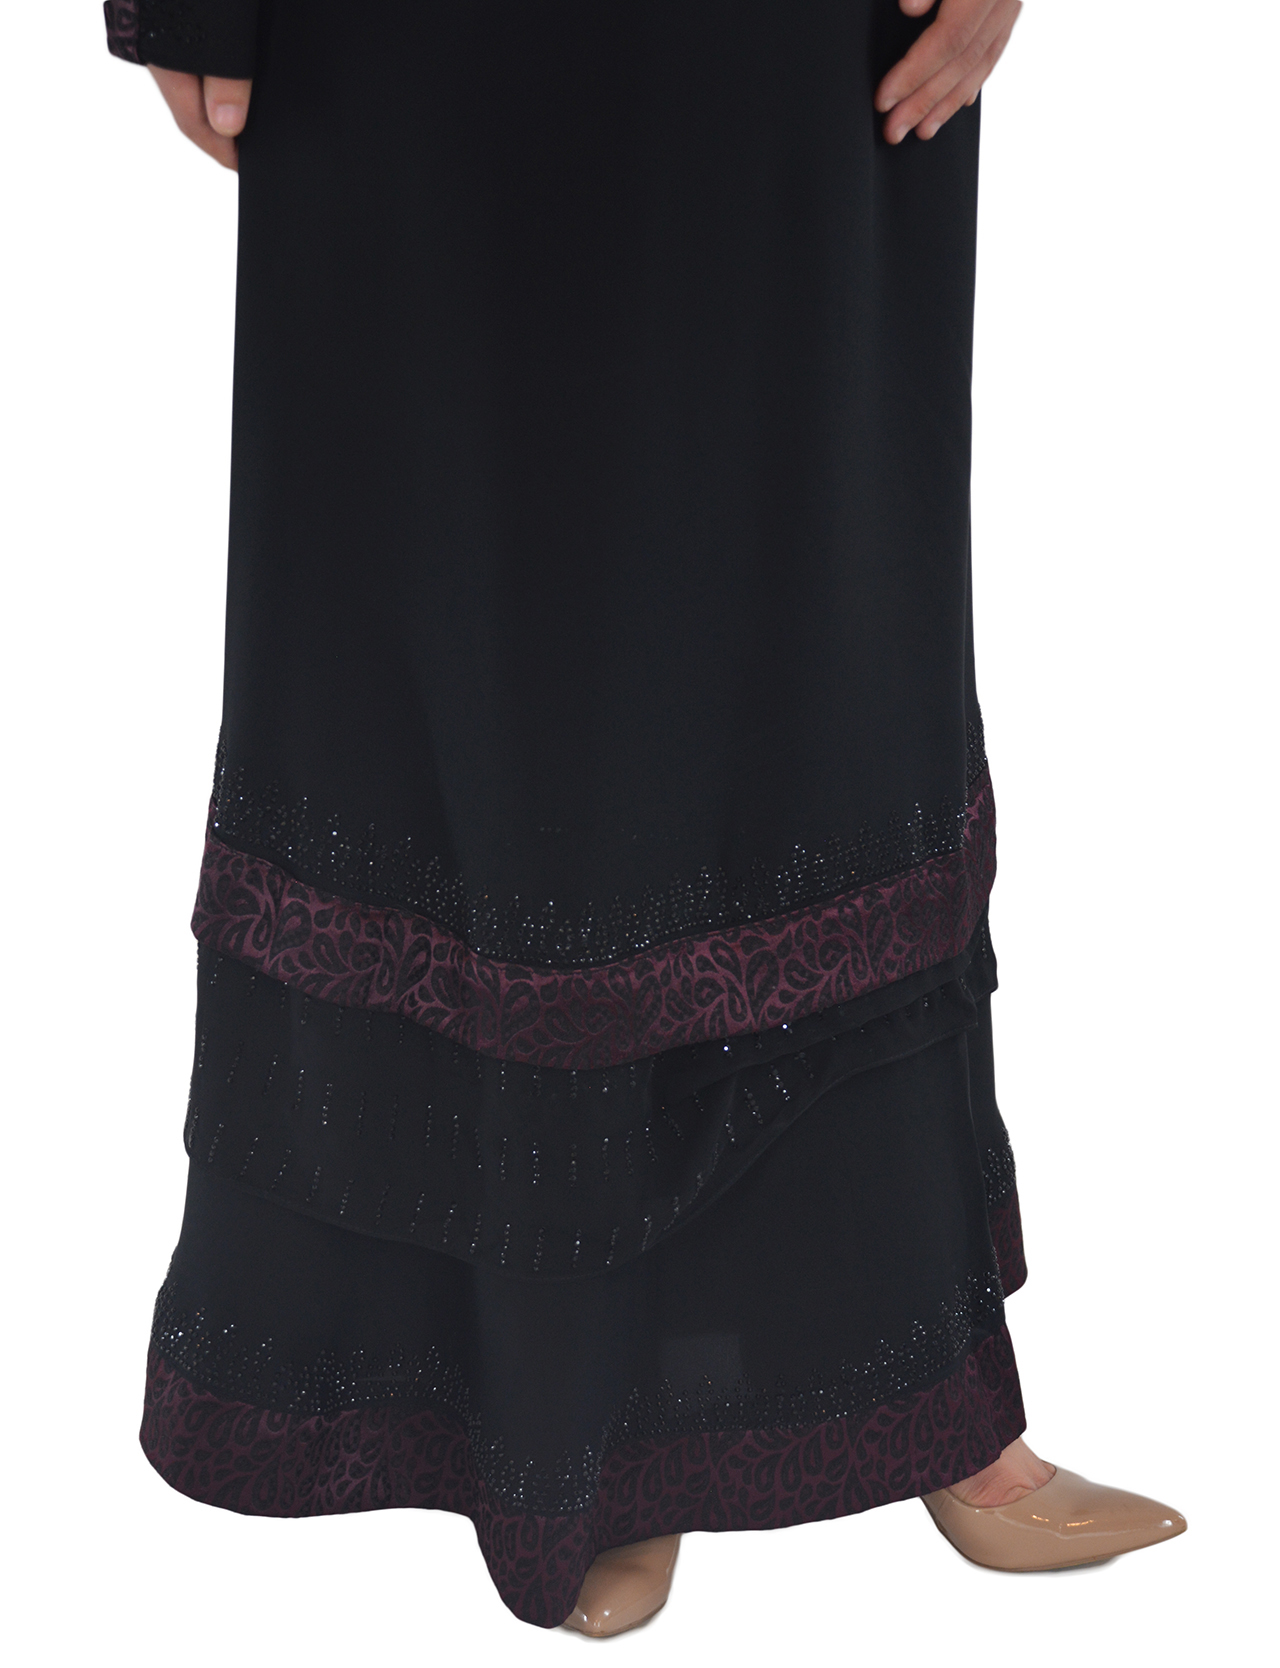 Pervin - Paisley, Purple and Black Abaya Close up 2